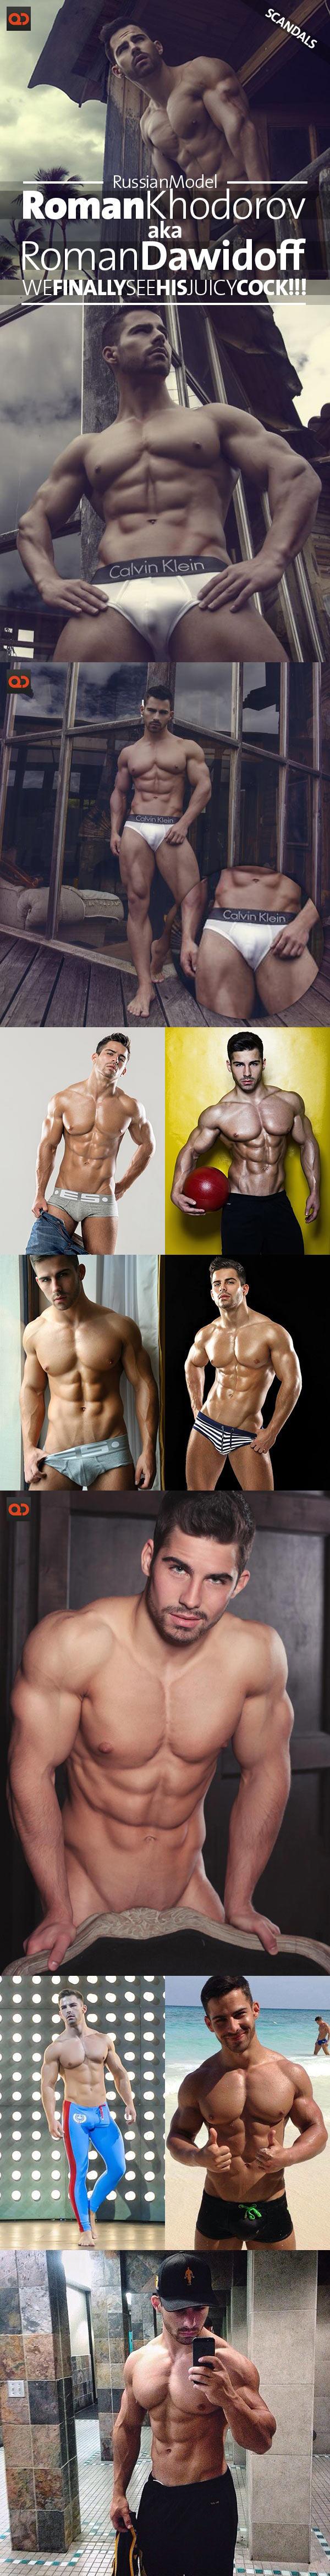 russian bare nudist 1 boy